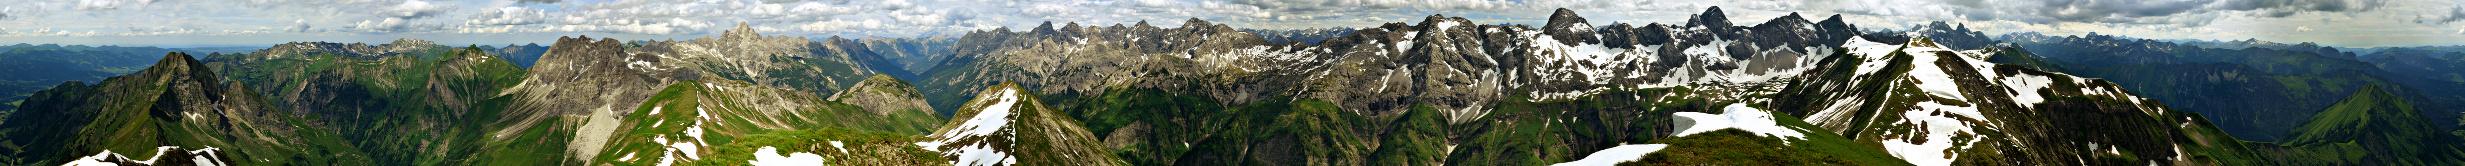 Rauheck (Rauhegg): Gipfel-Panorama